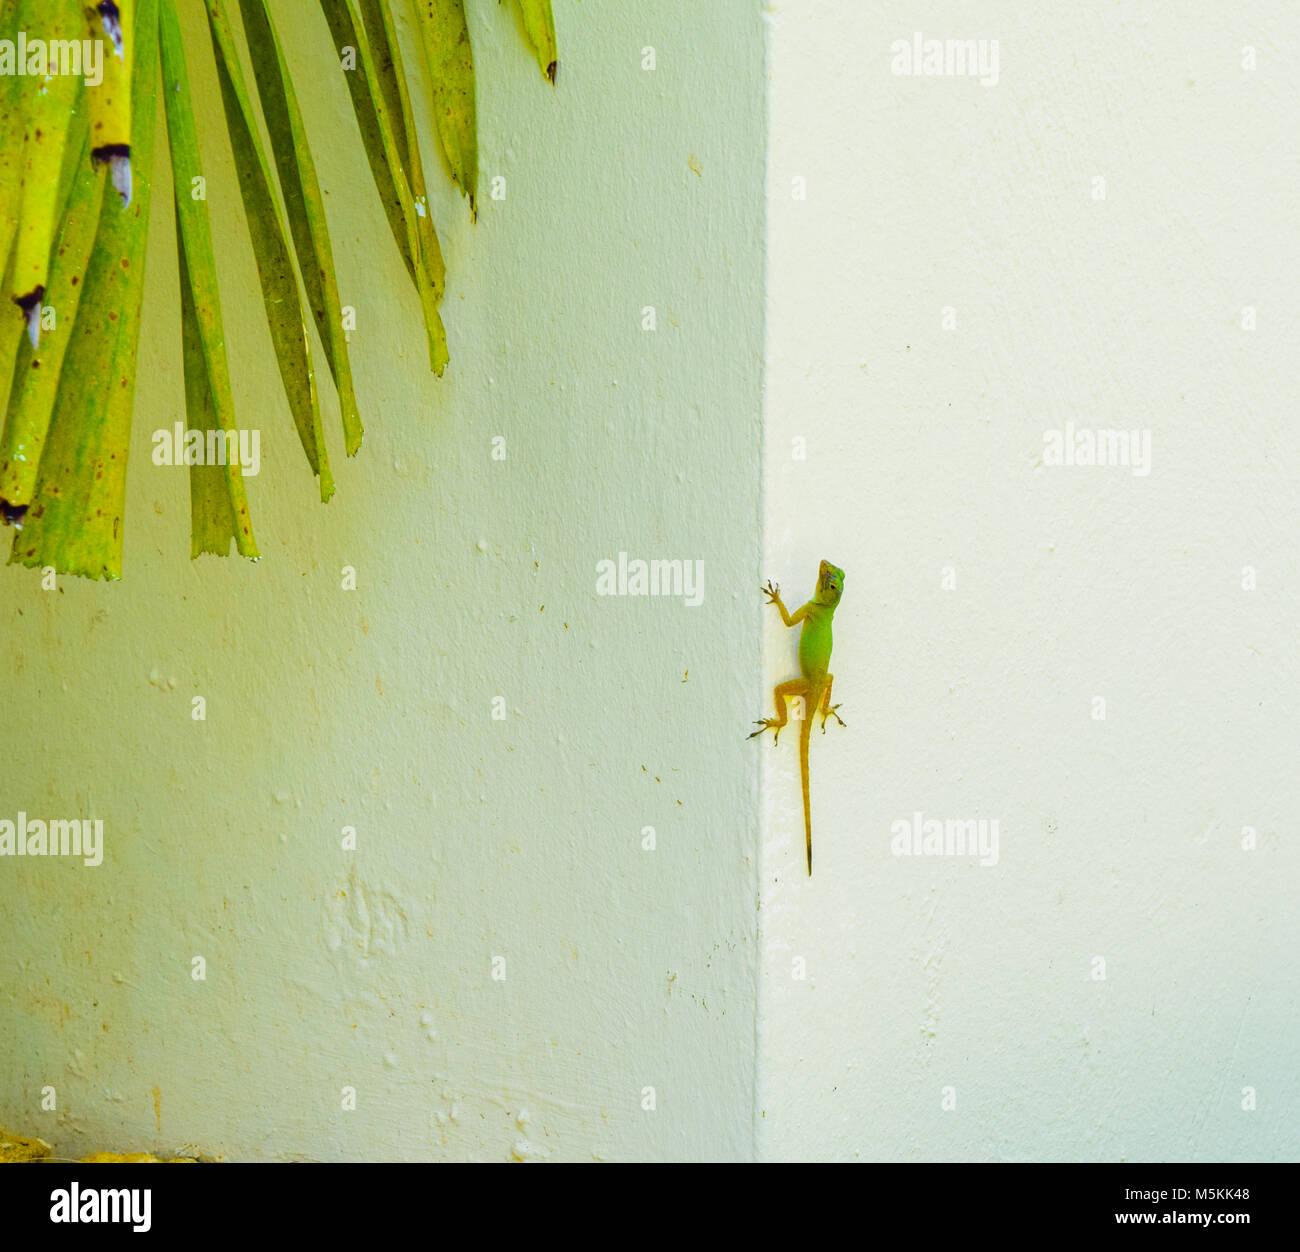 Lizard Reptile climbing on a wall - Stock Image